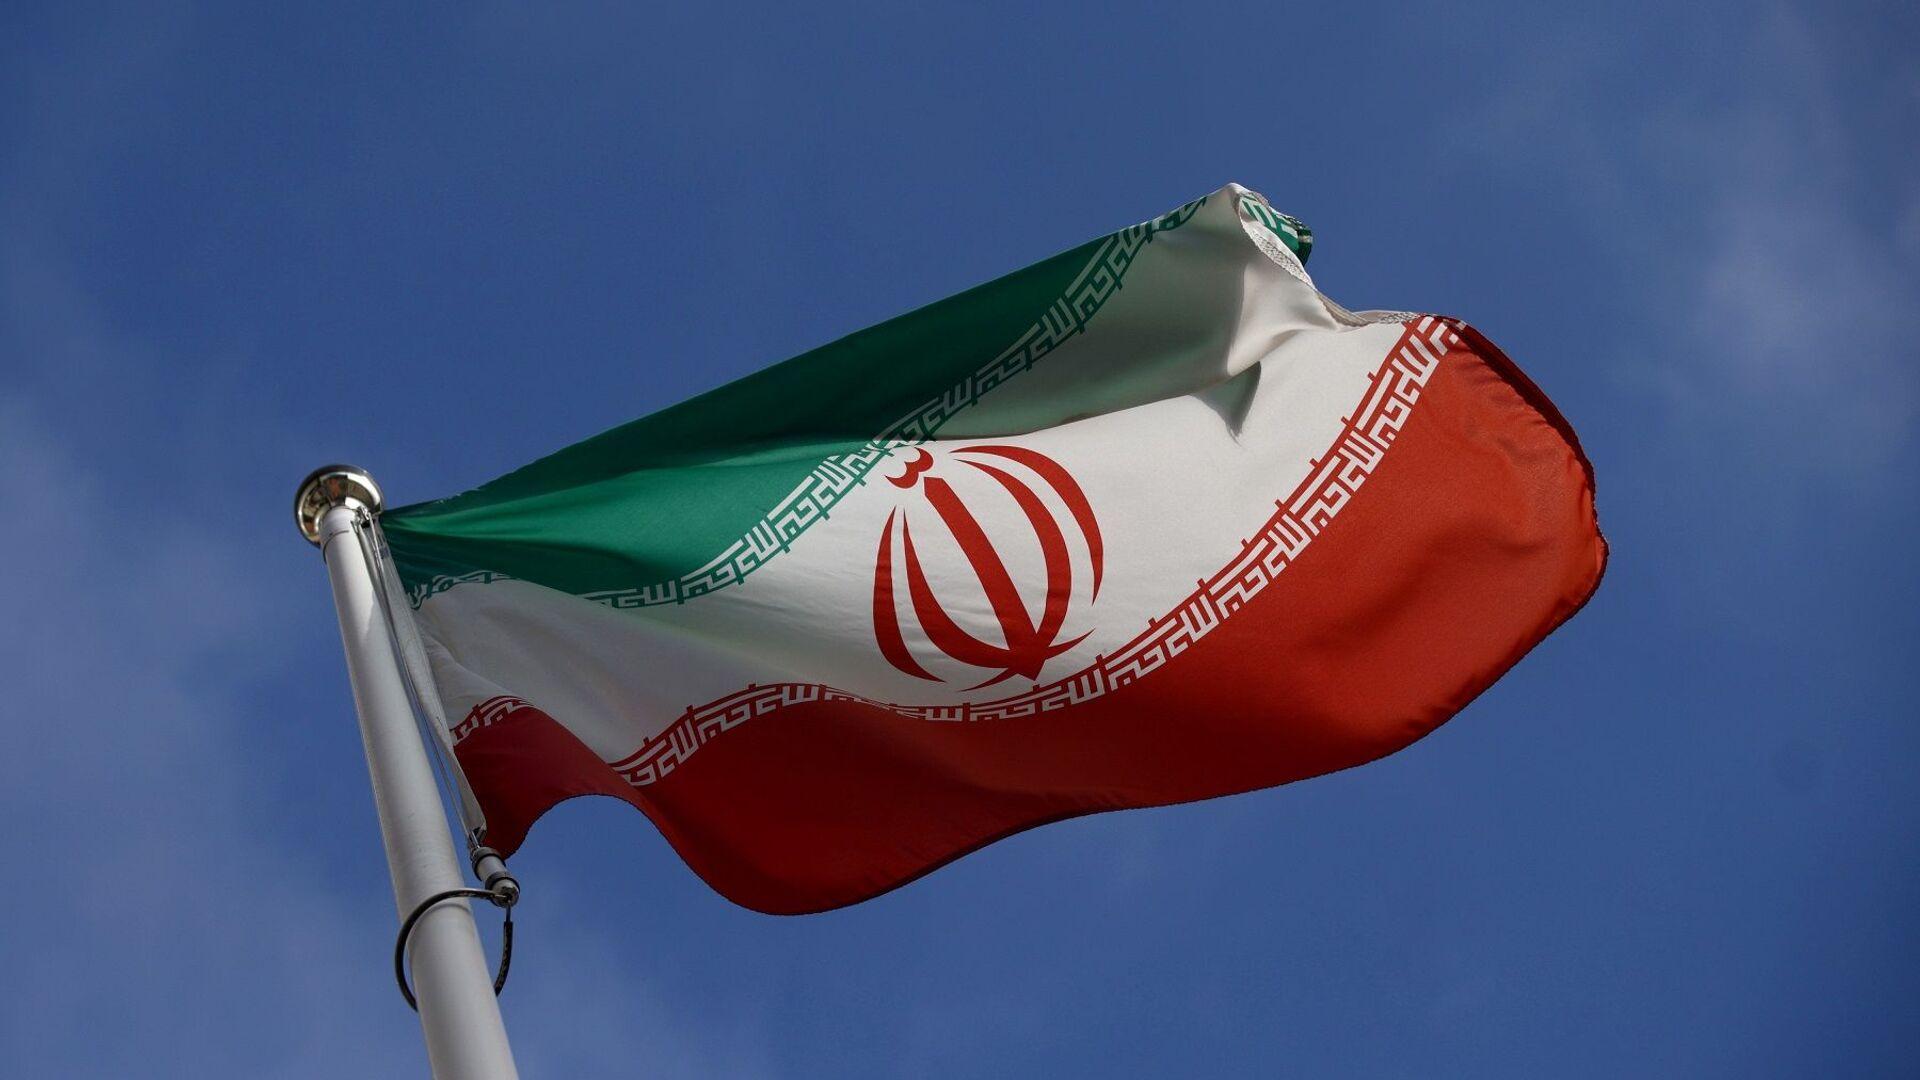 İran - bayrak - İran bayrağı - Sputnik Türkiye, 1920, 23.08.2021